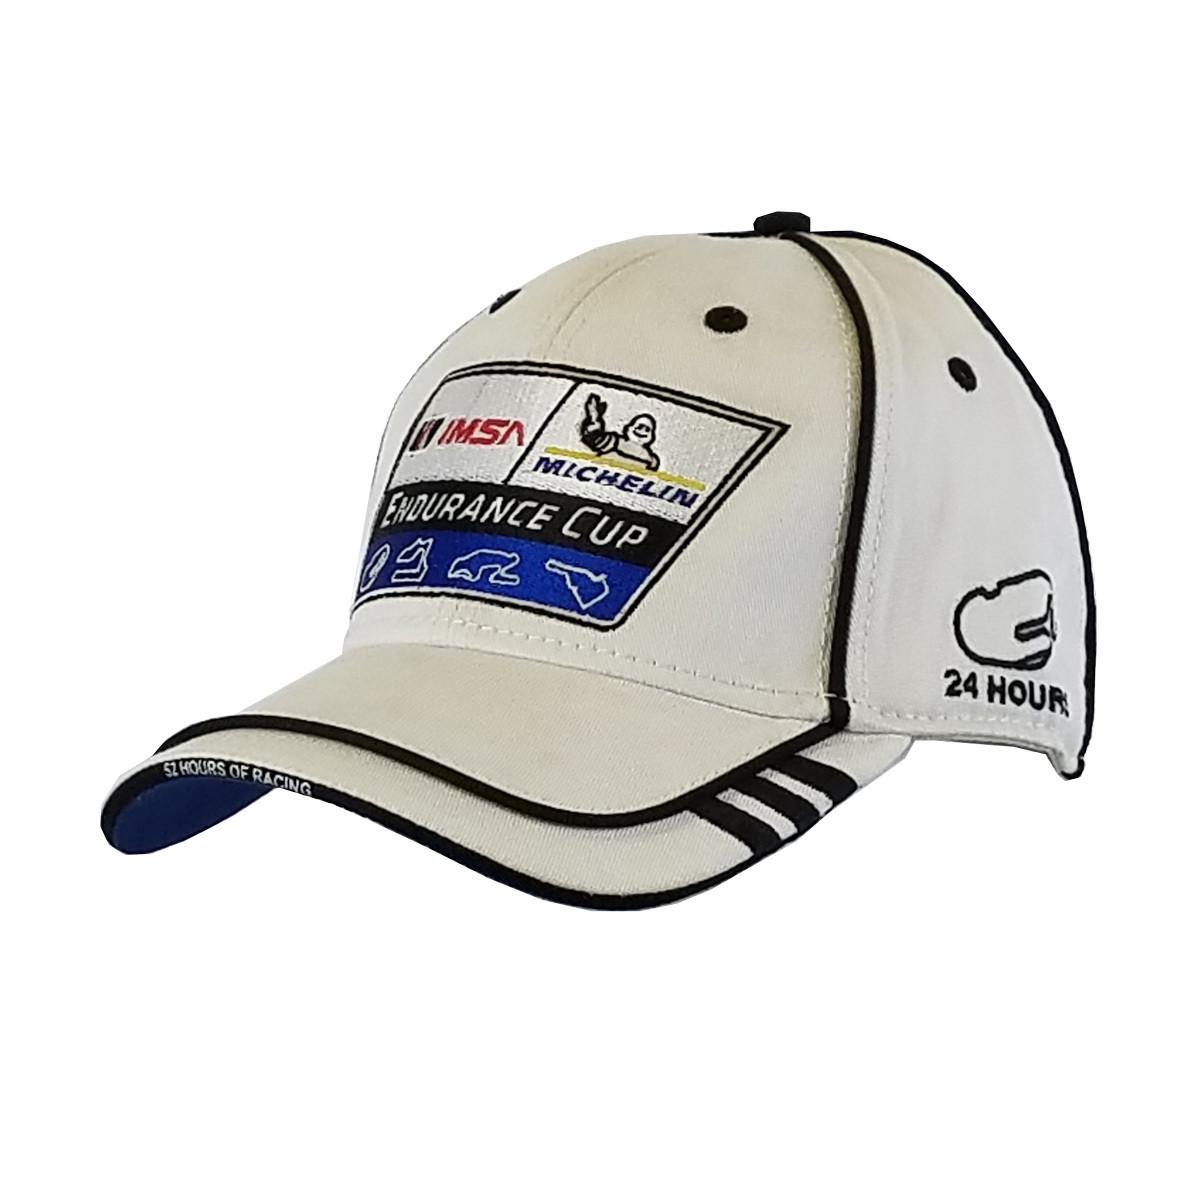 IMSA Endurance Cup Hat - White